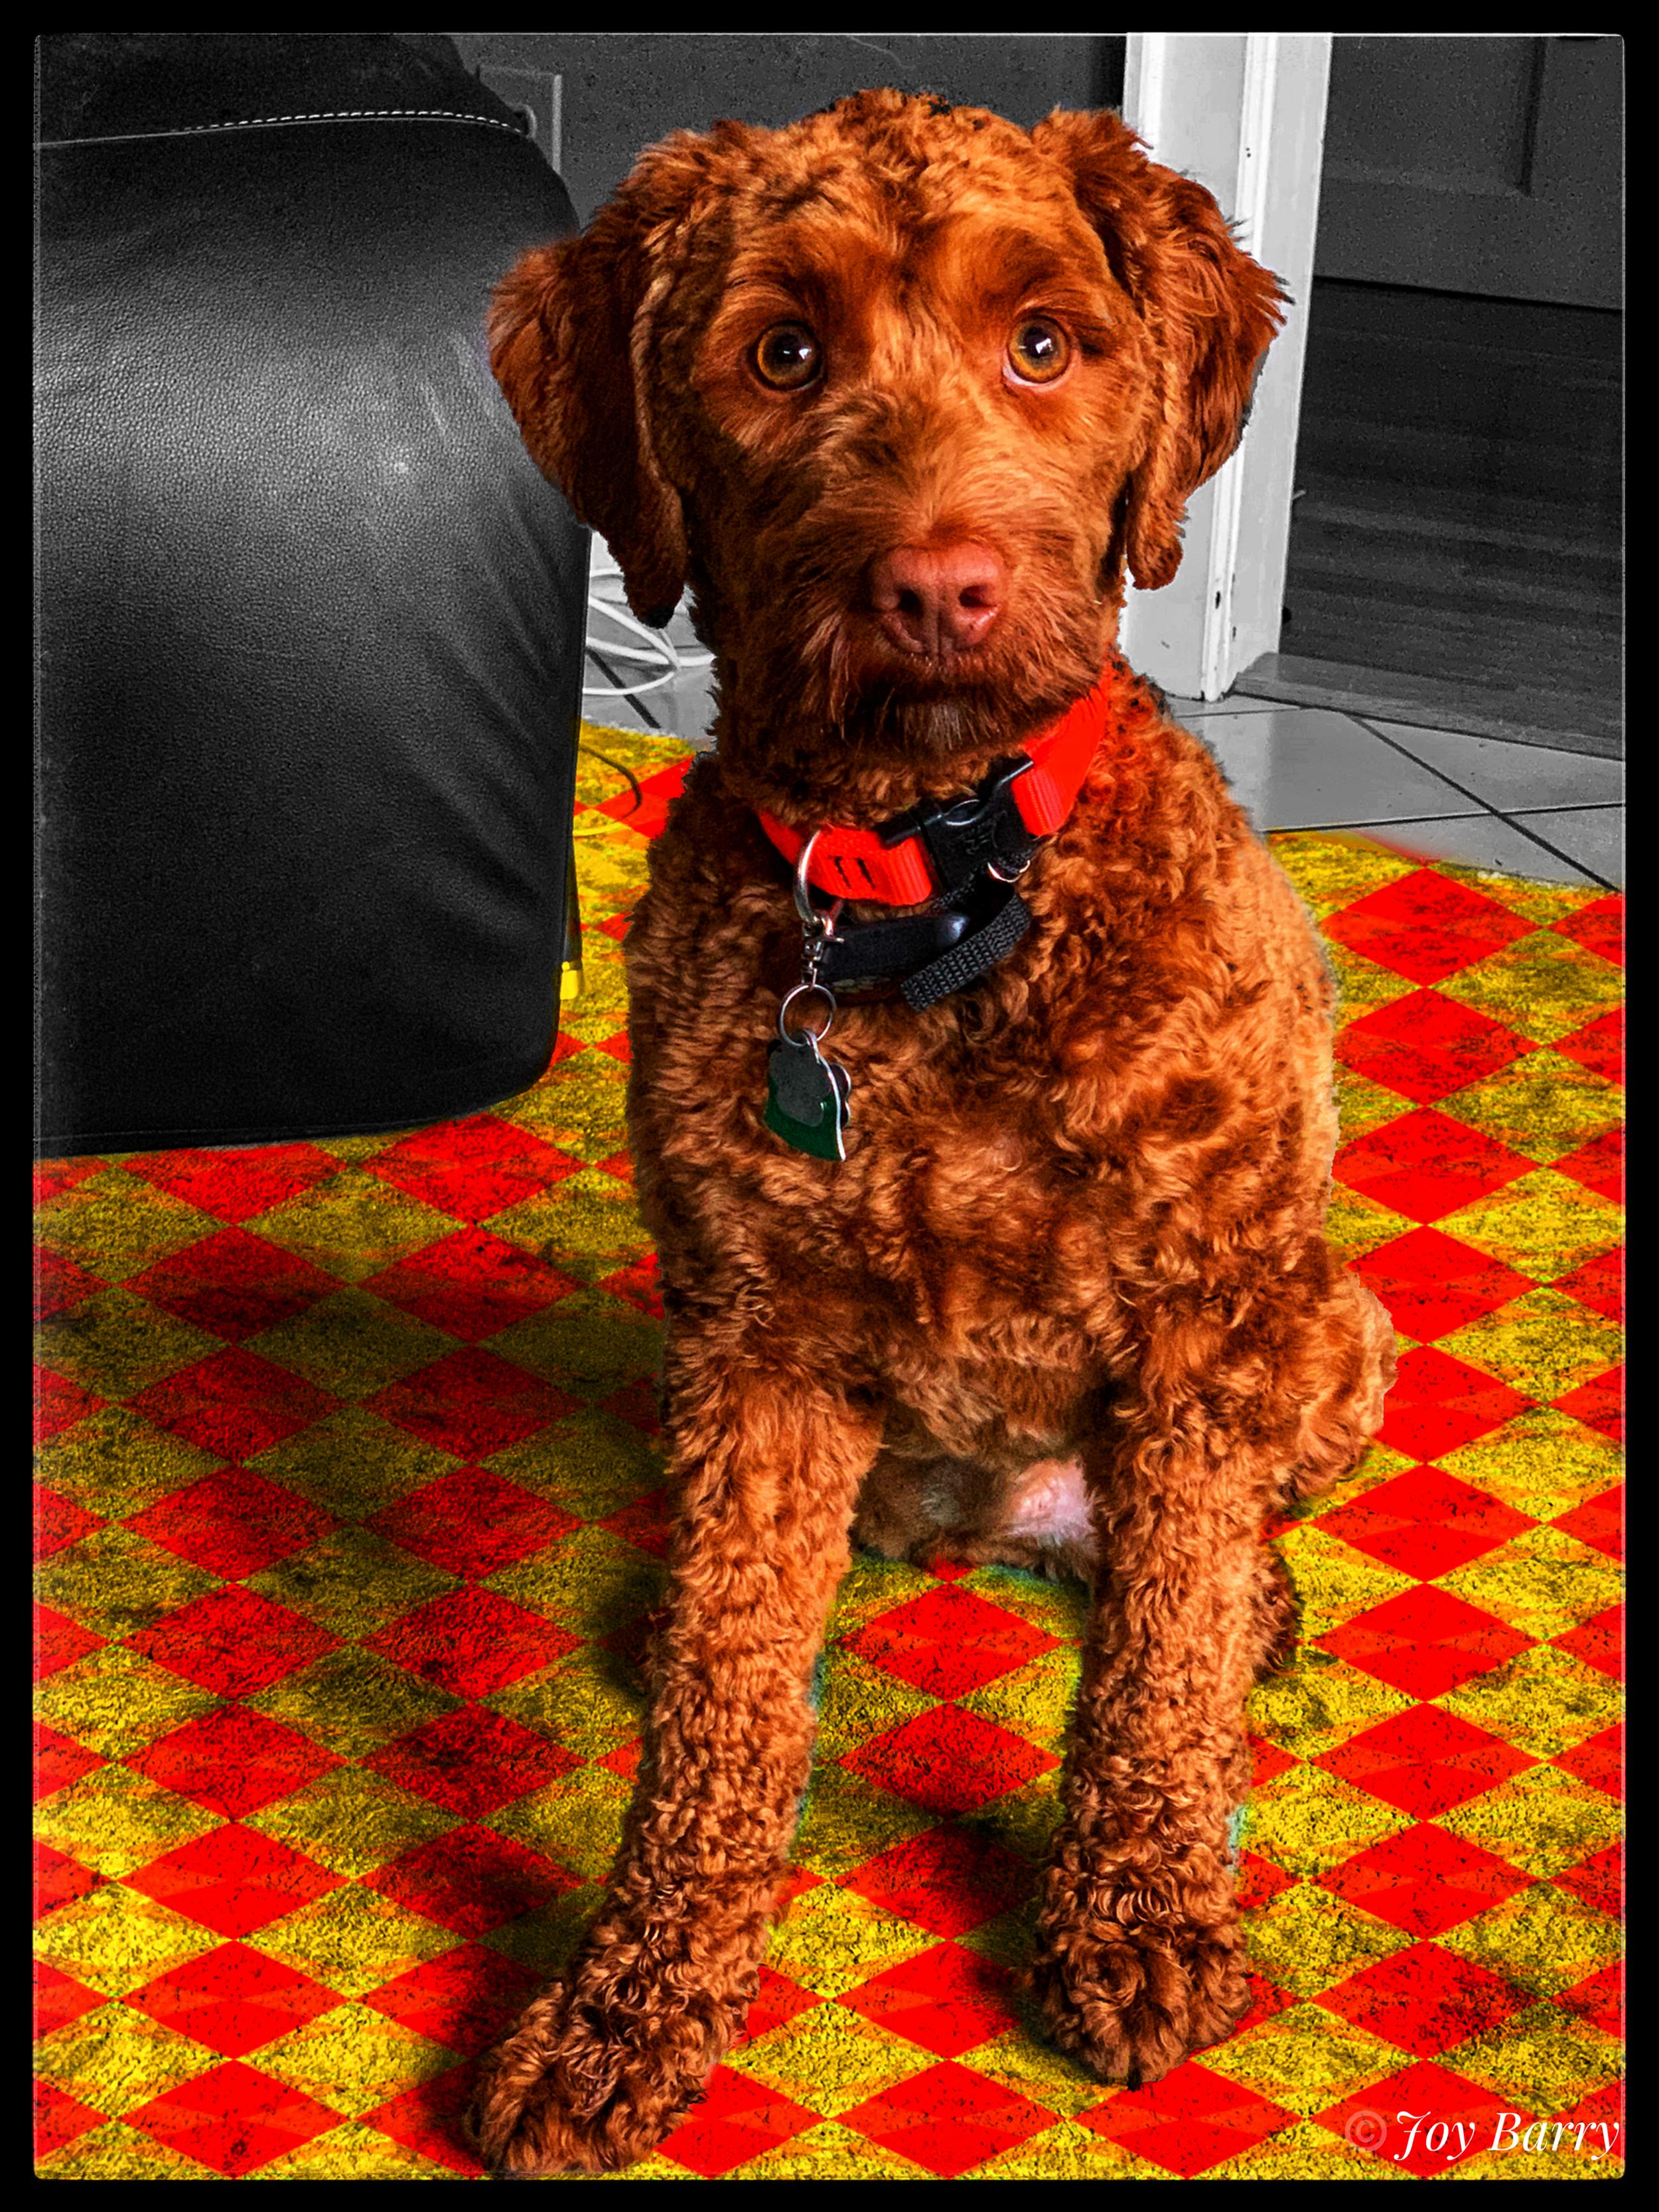 April 3, 2019 - My dapper little dude, KerrBee.